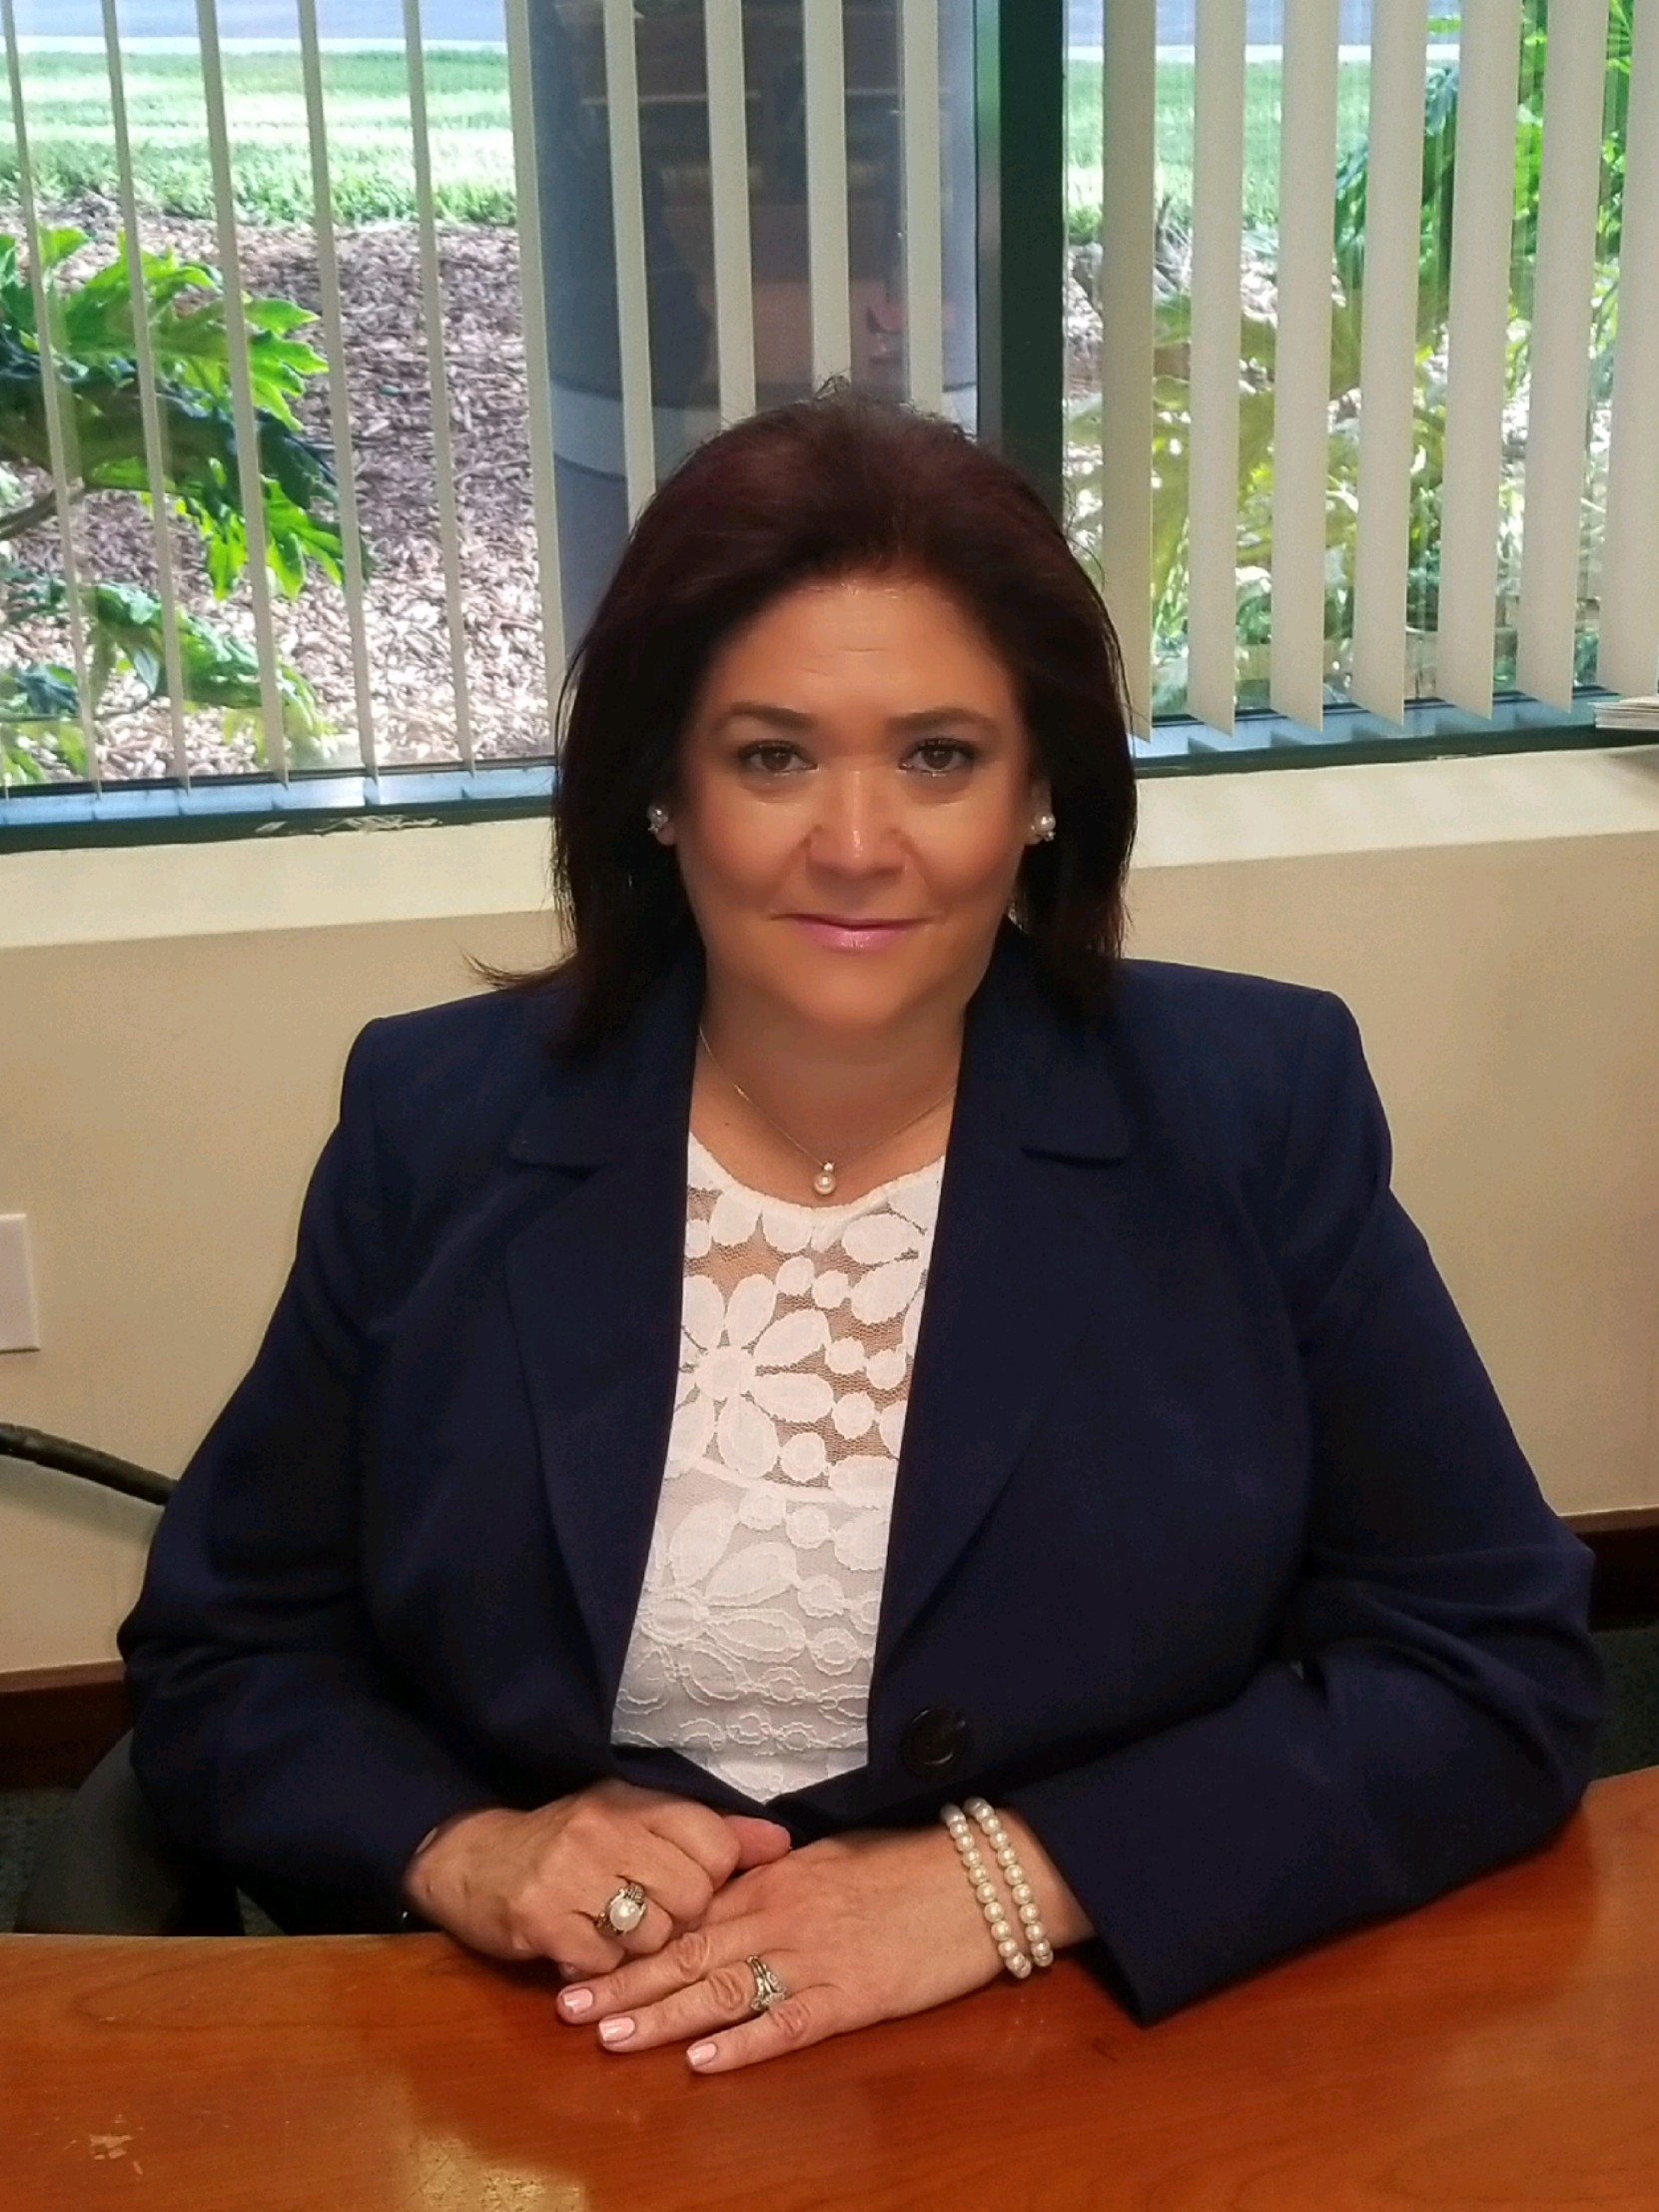 Best of Doral™ Banks presents Julie Suarez.